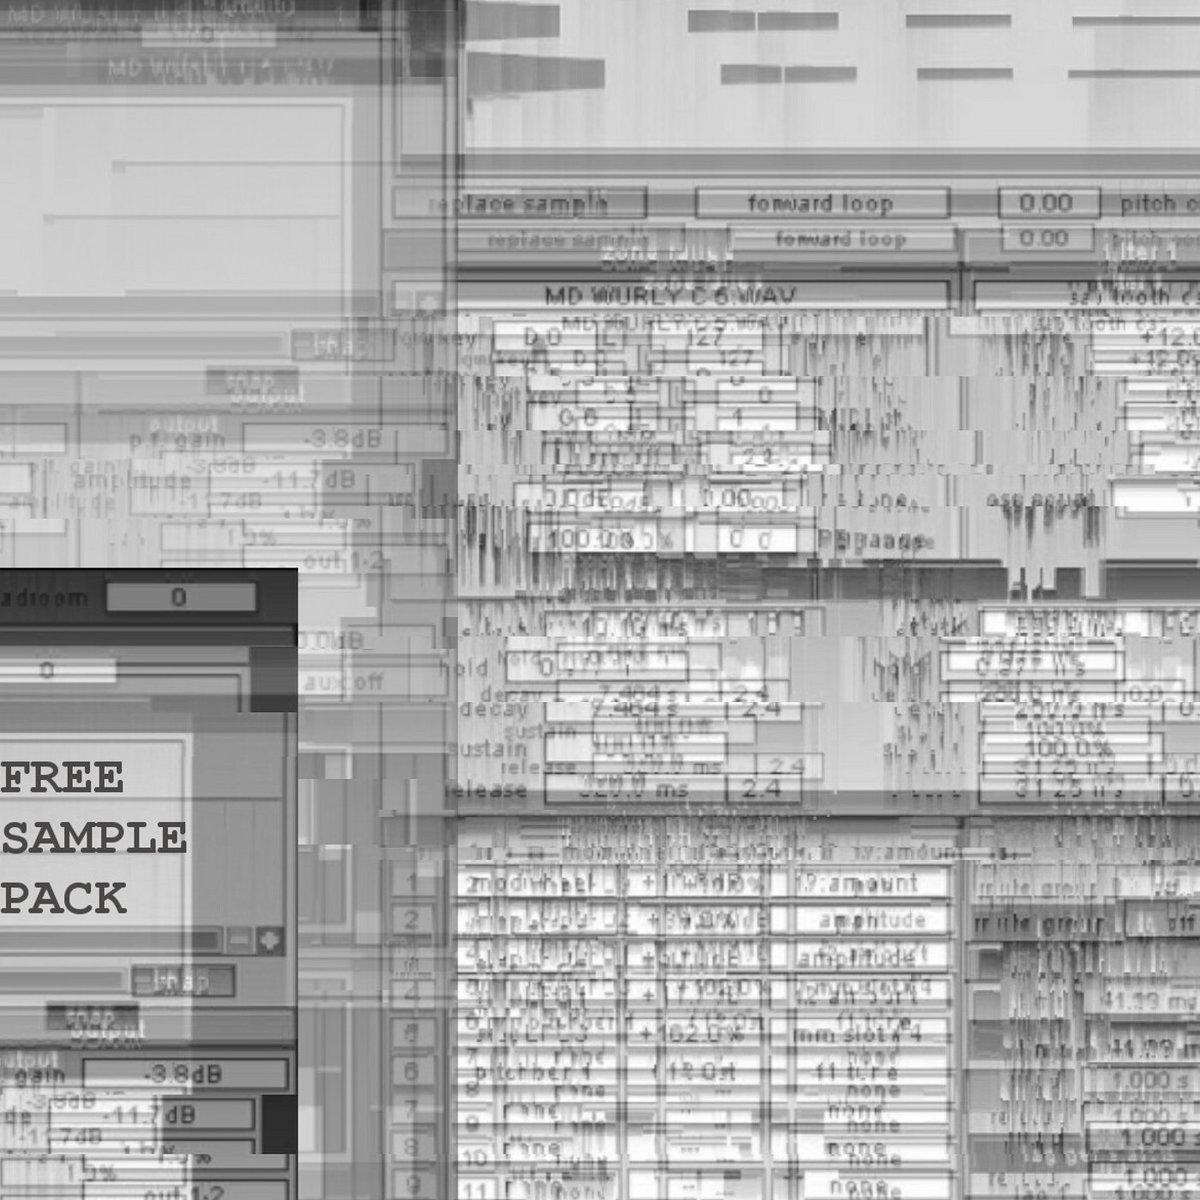 Free Sample Pack 2 | Sleeper